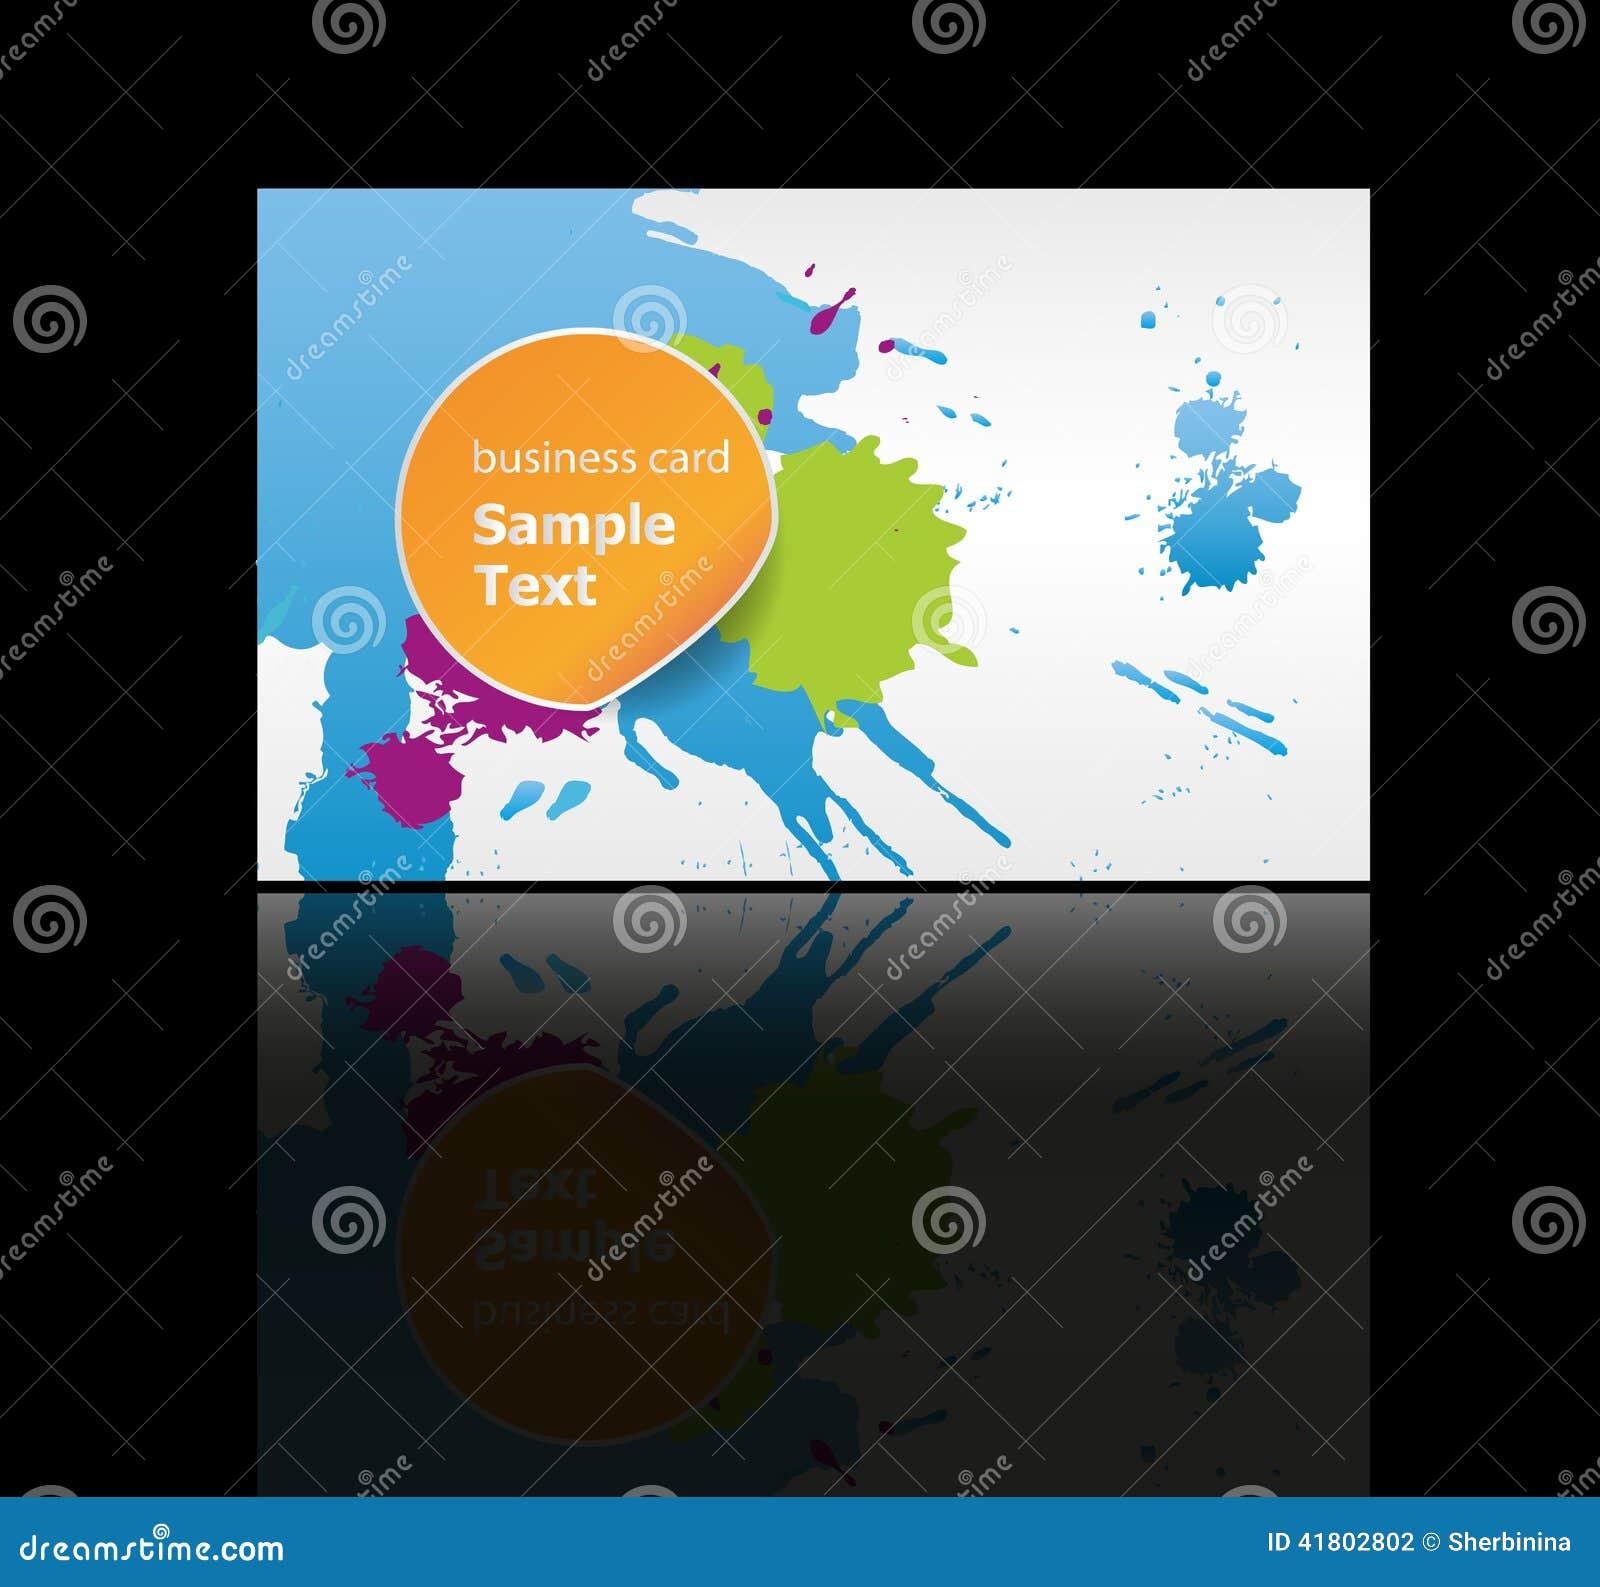 Business Cards Background Design